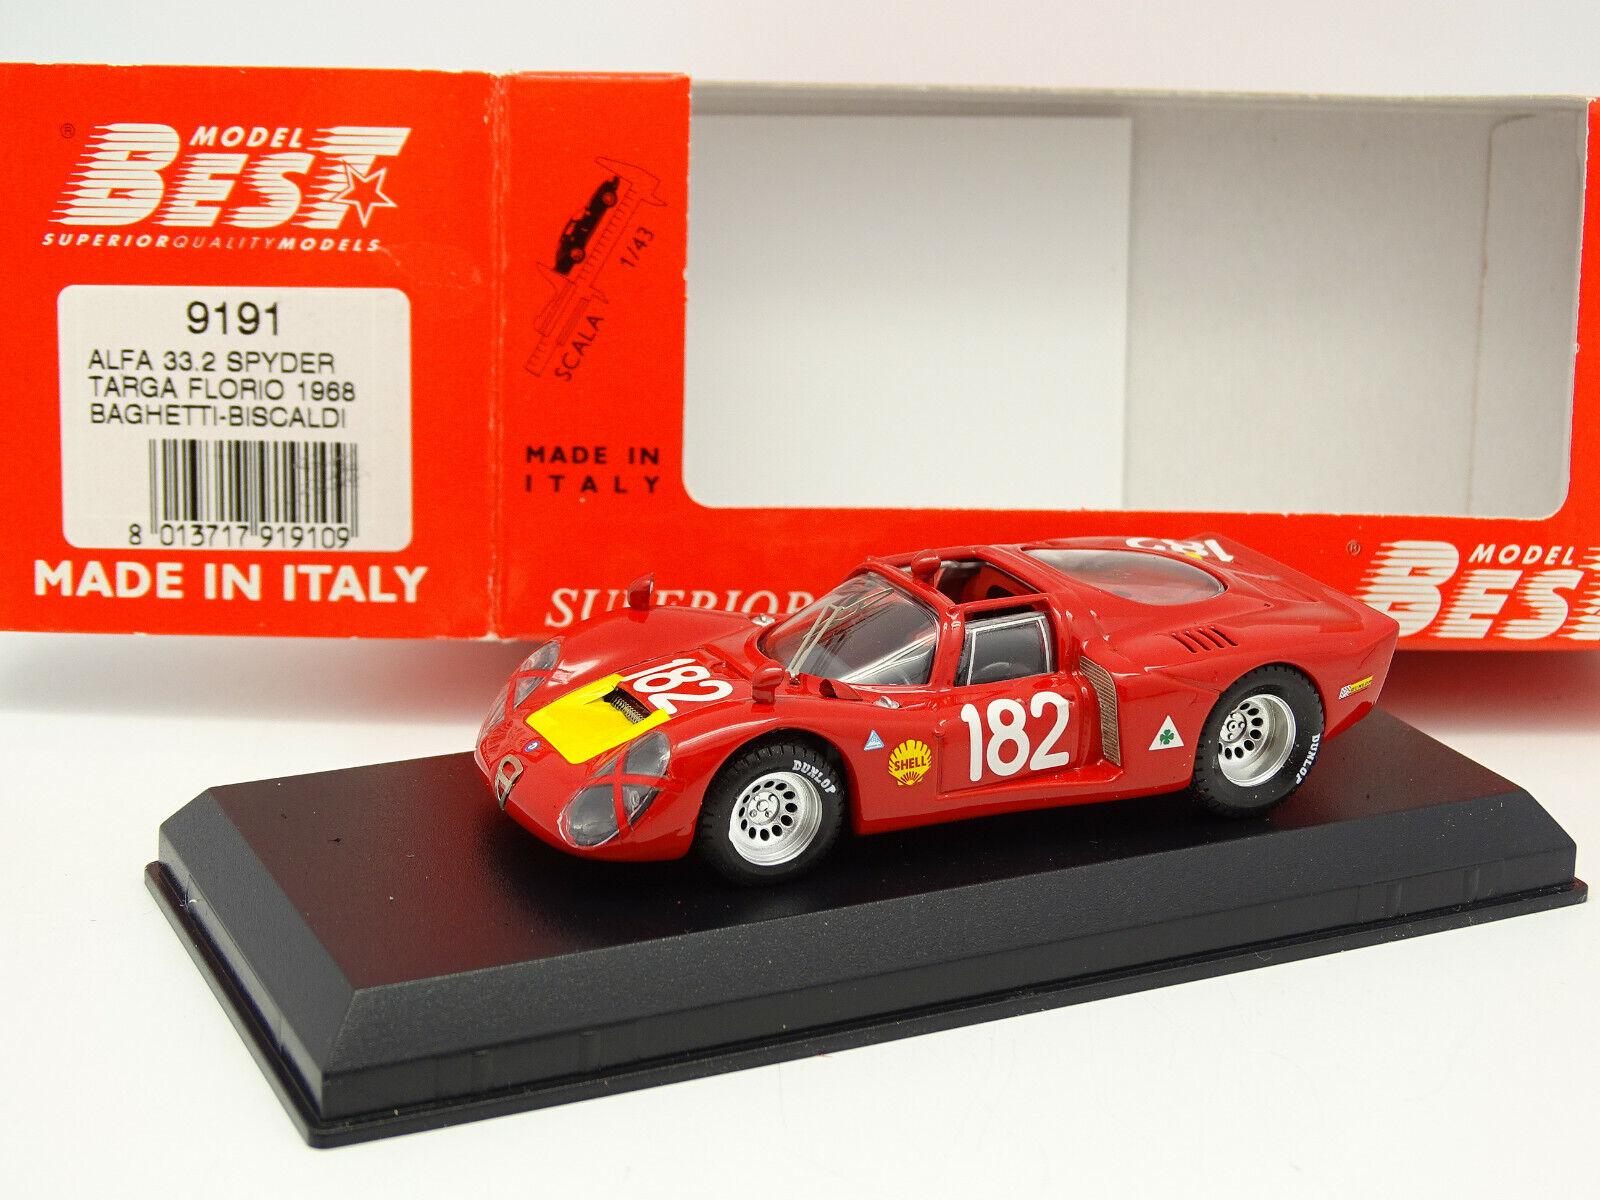 Best 1 43 - Alfa Romeo 33.2 Spyder Targa Florio 1968 N.182